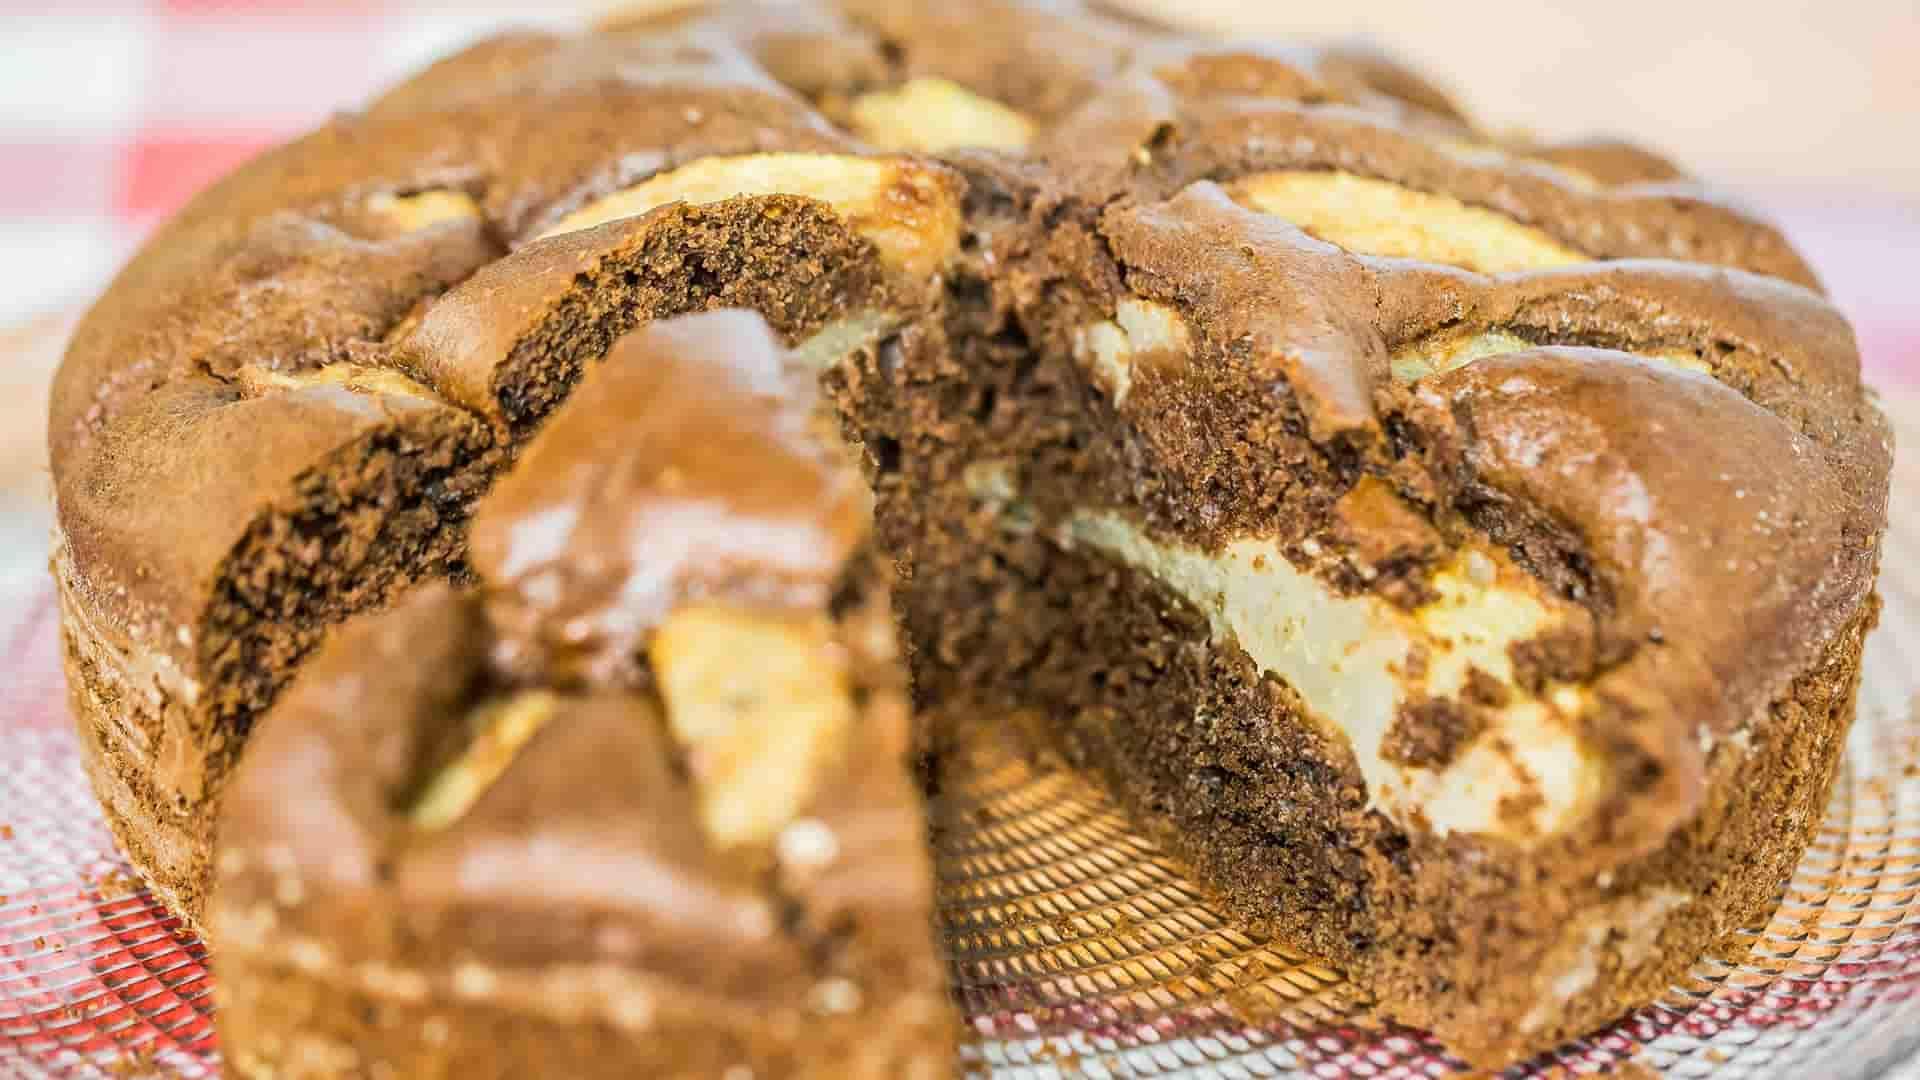 Cucina sana: torta a basso indice glicemico